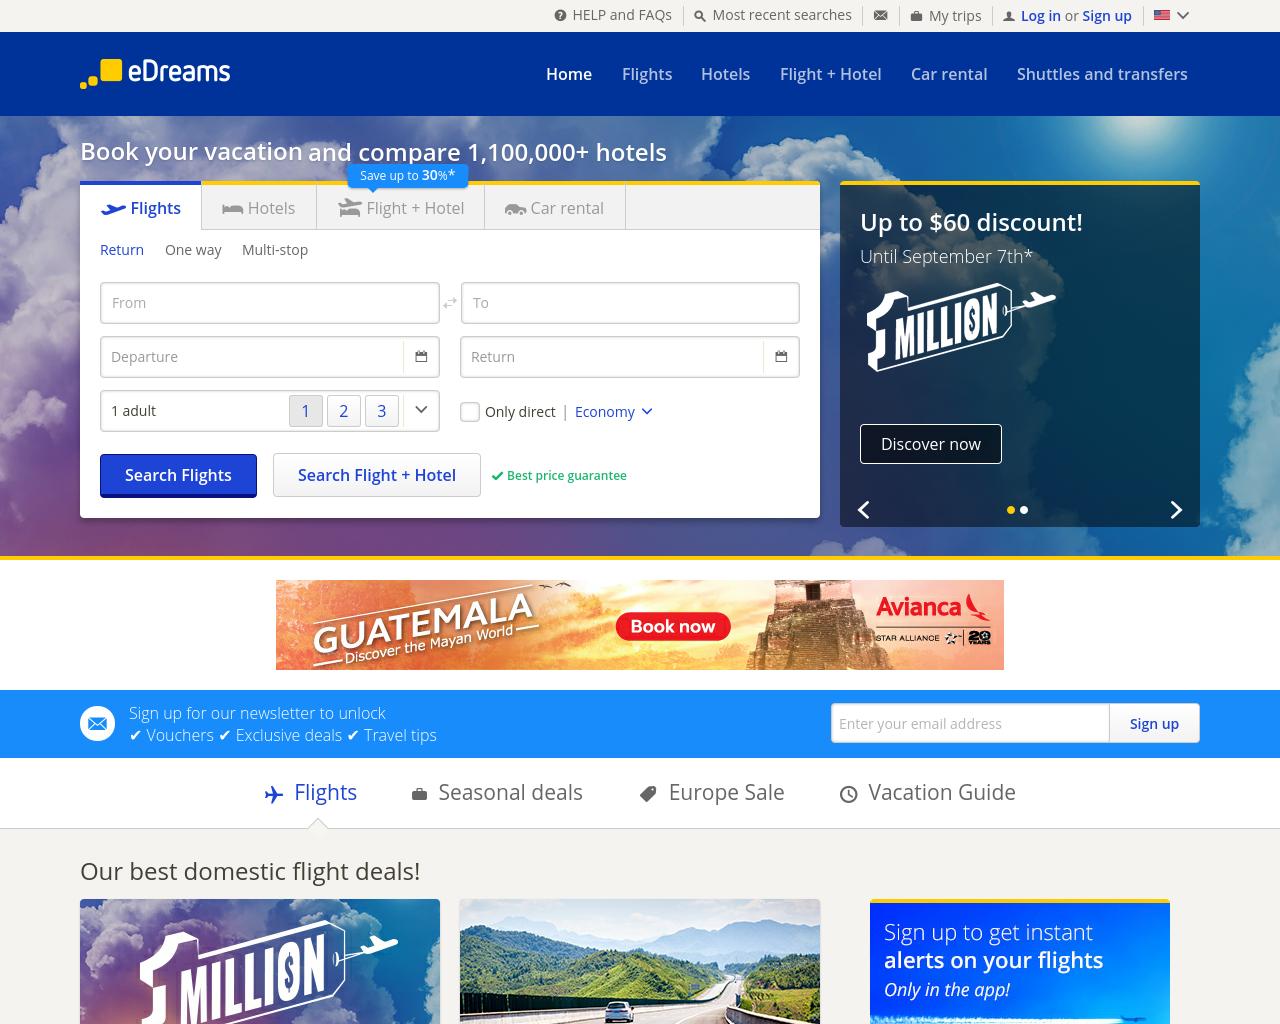 eDreams-Advertising-Reviews-Pricing